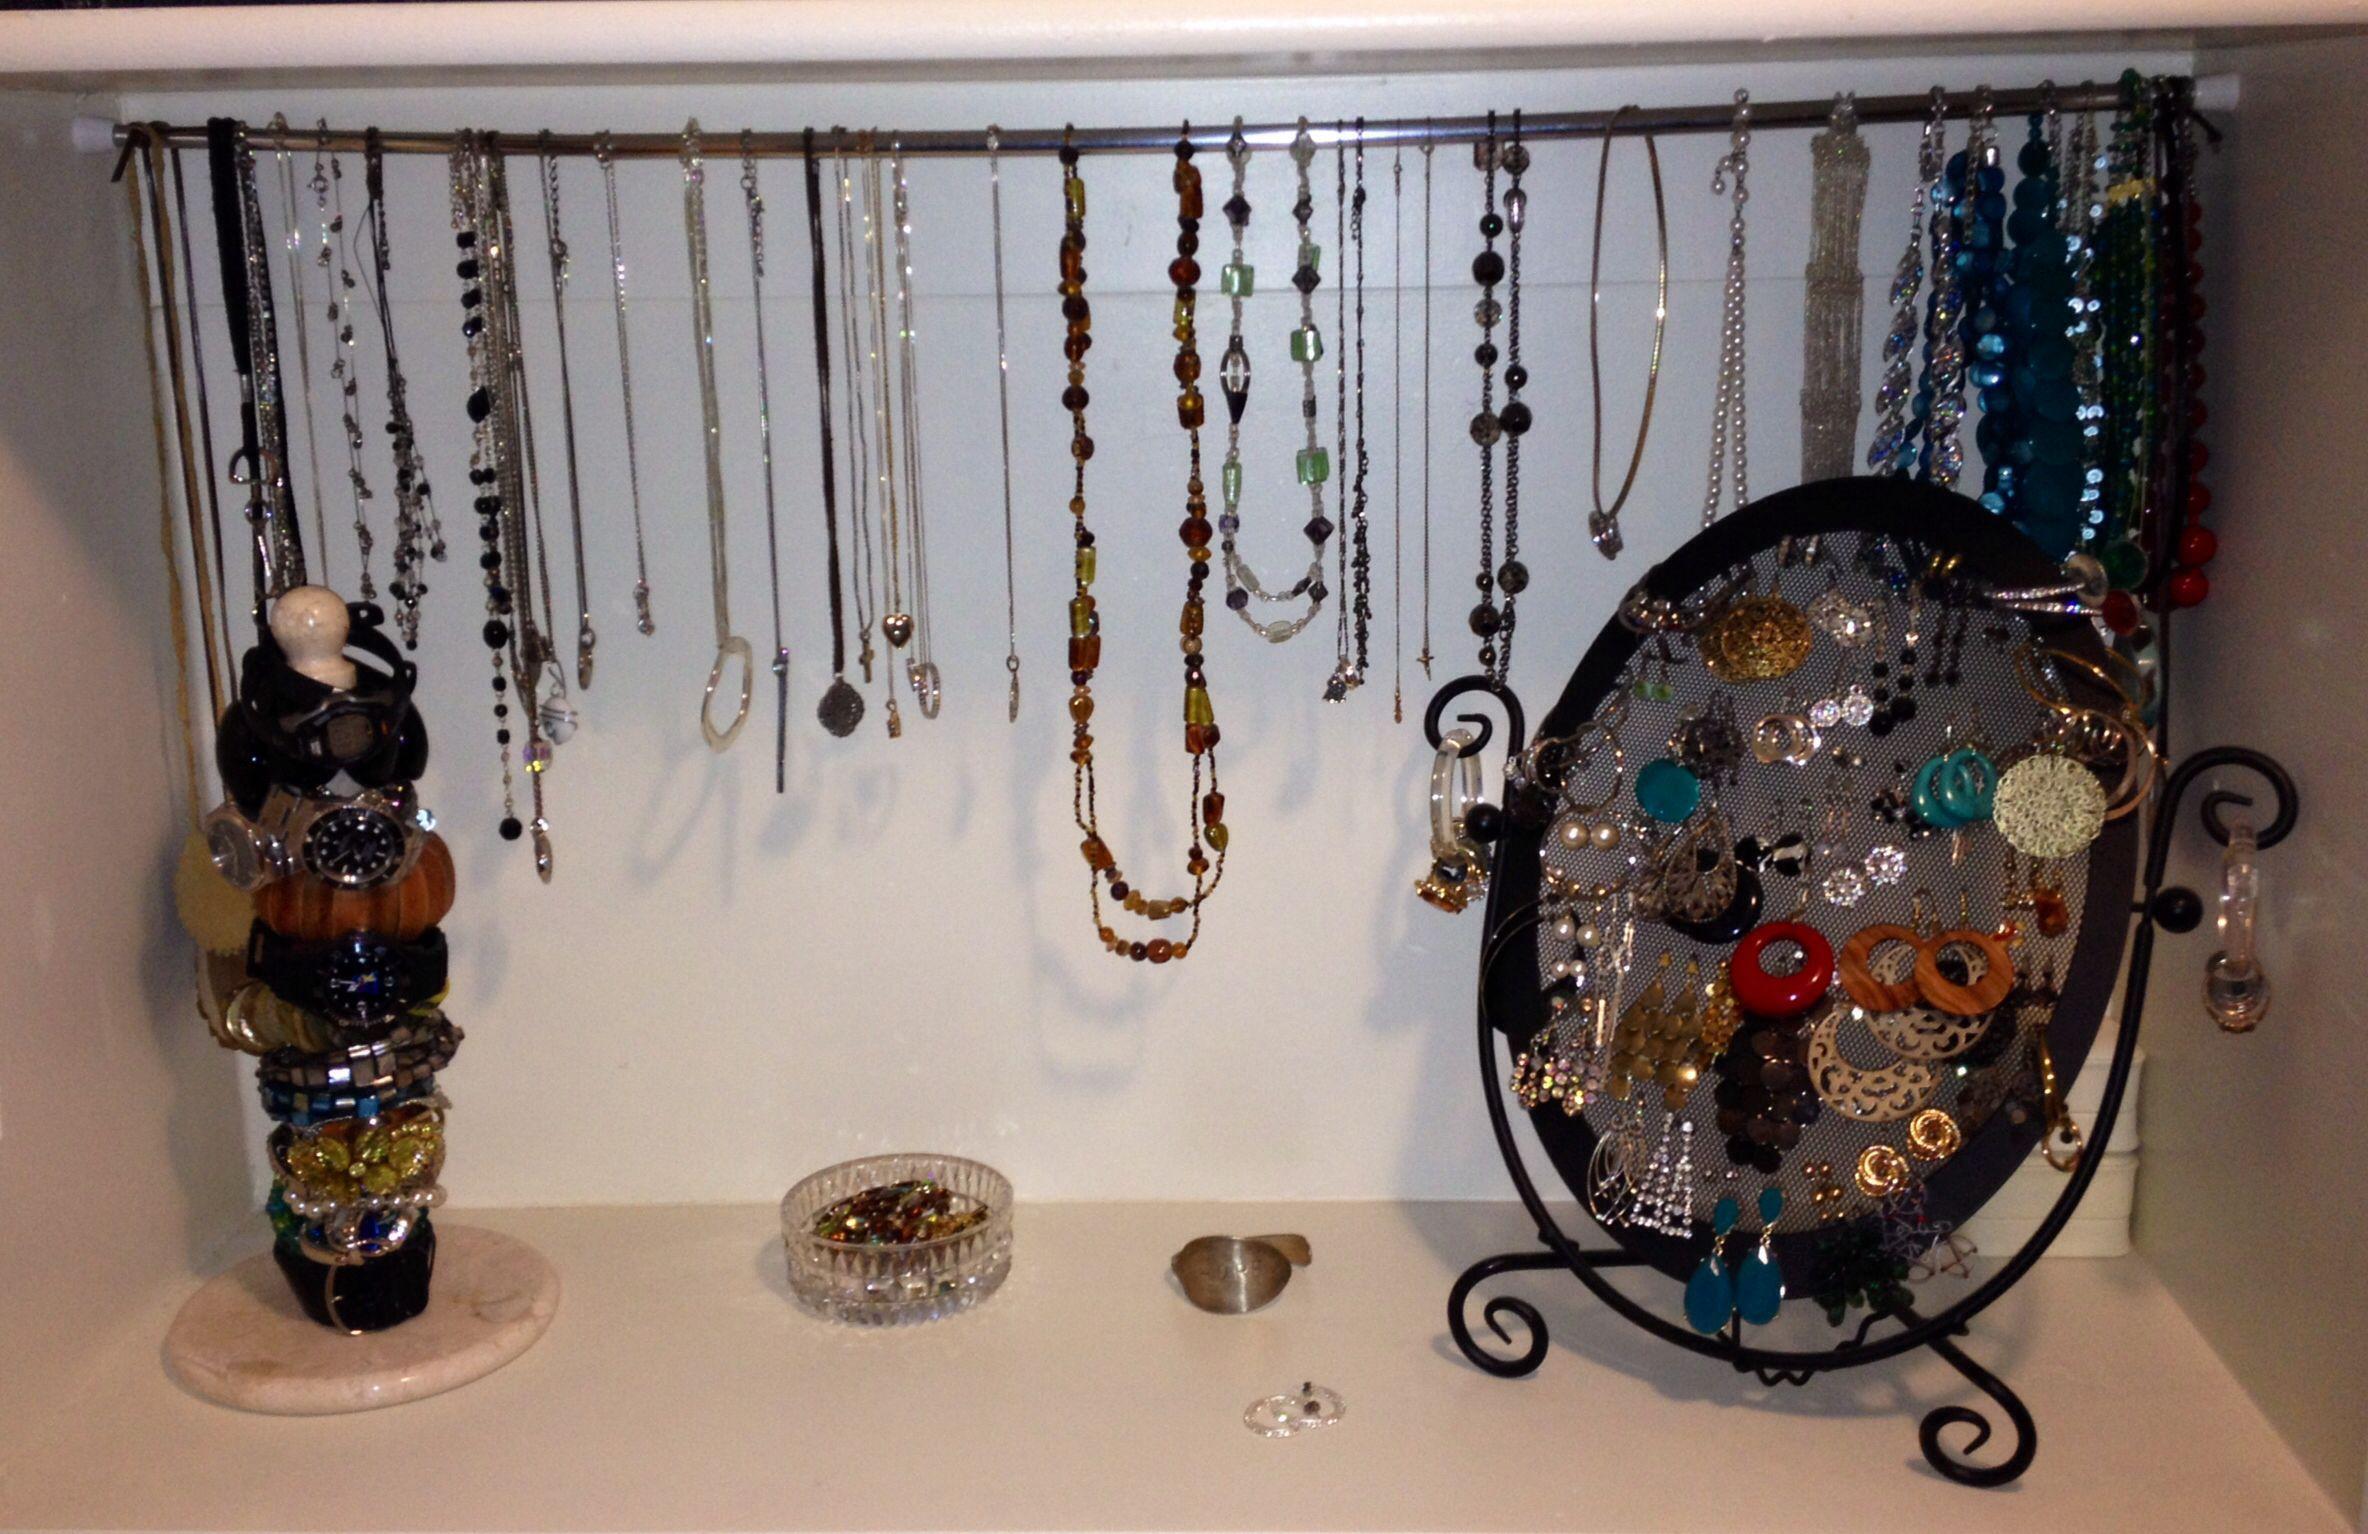 Diy Jewelry Organizer Shelf, Tension Rod Necklace Hanger, Paper Towel